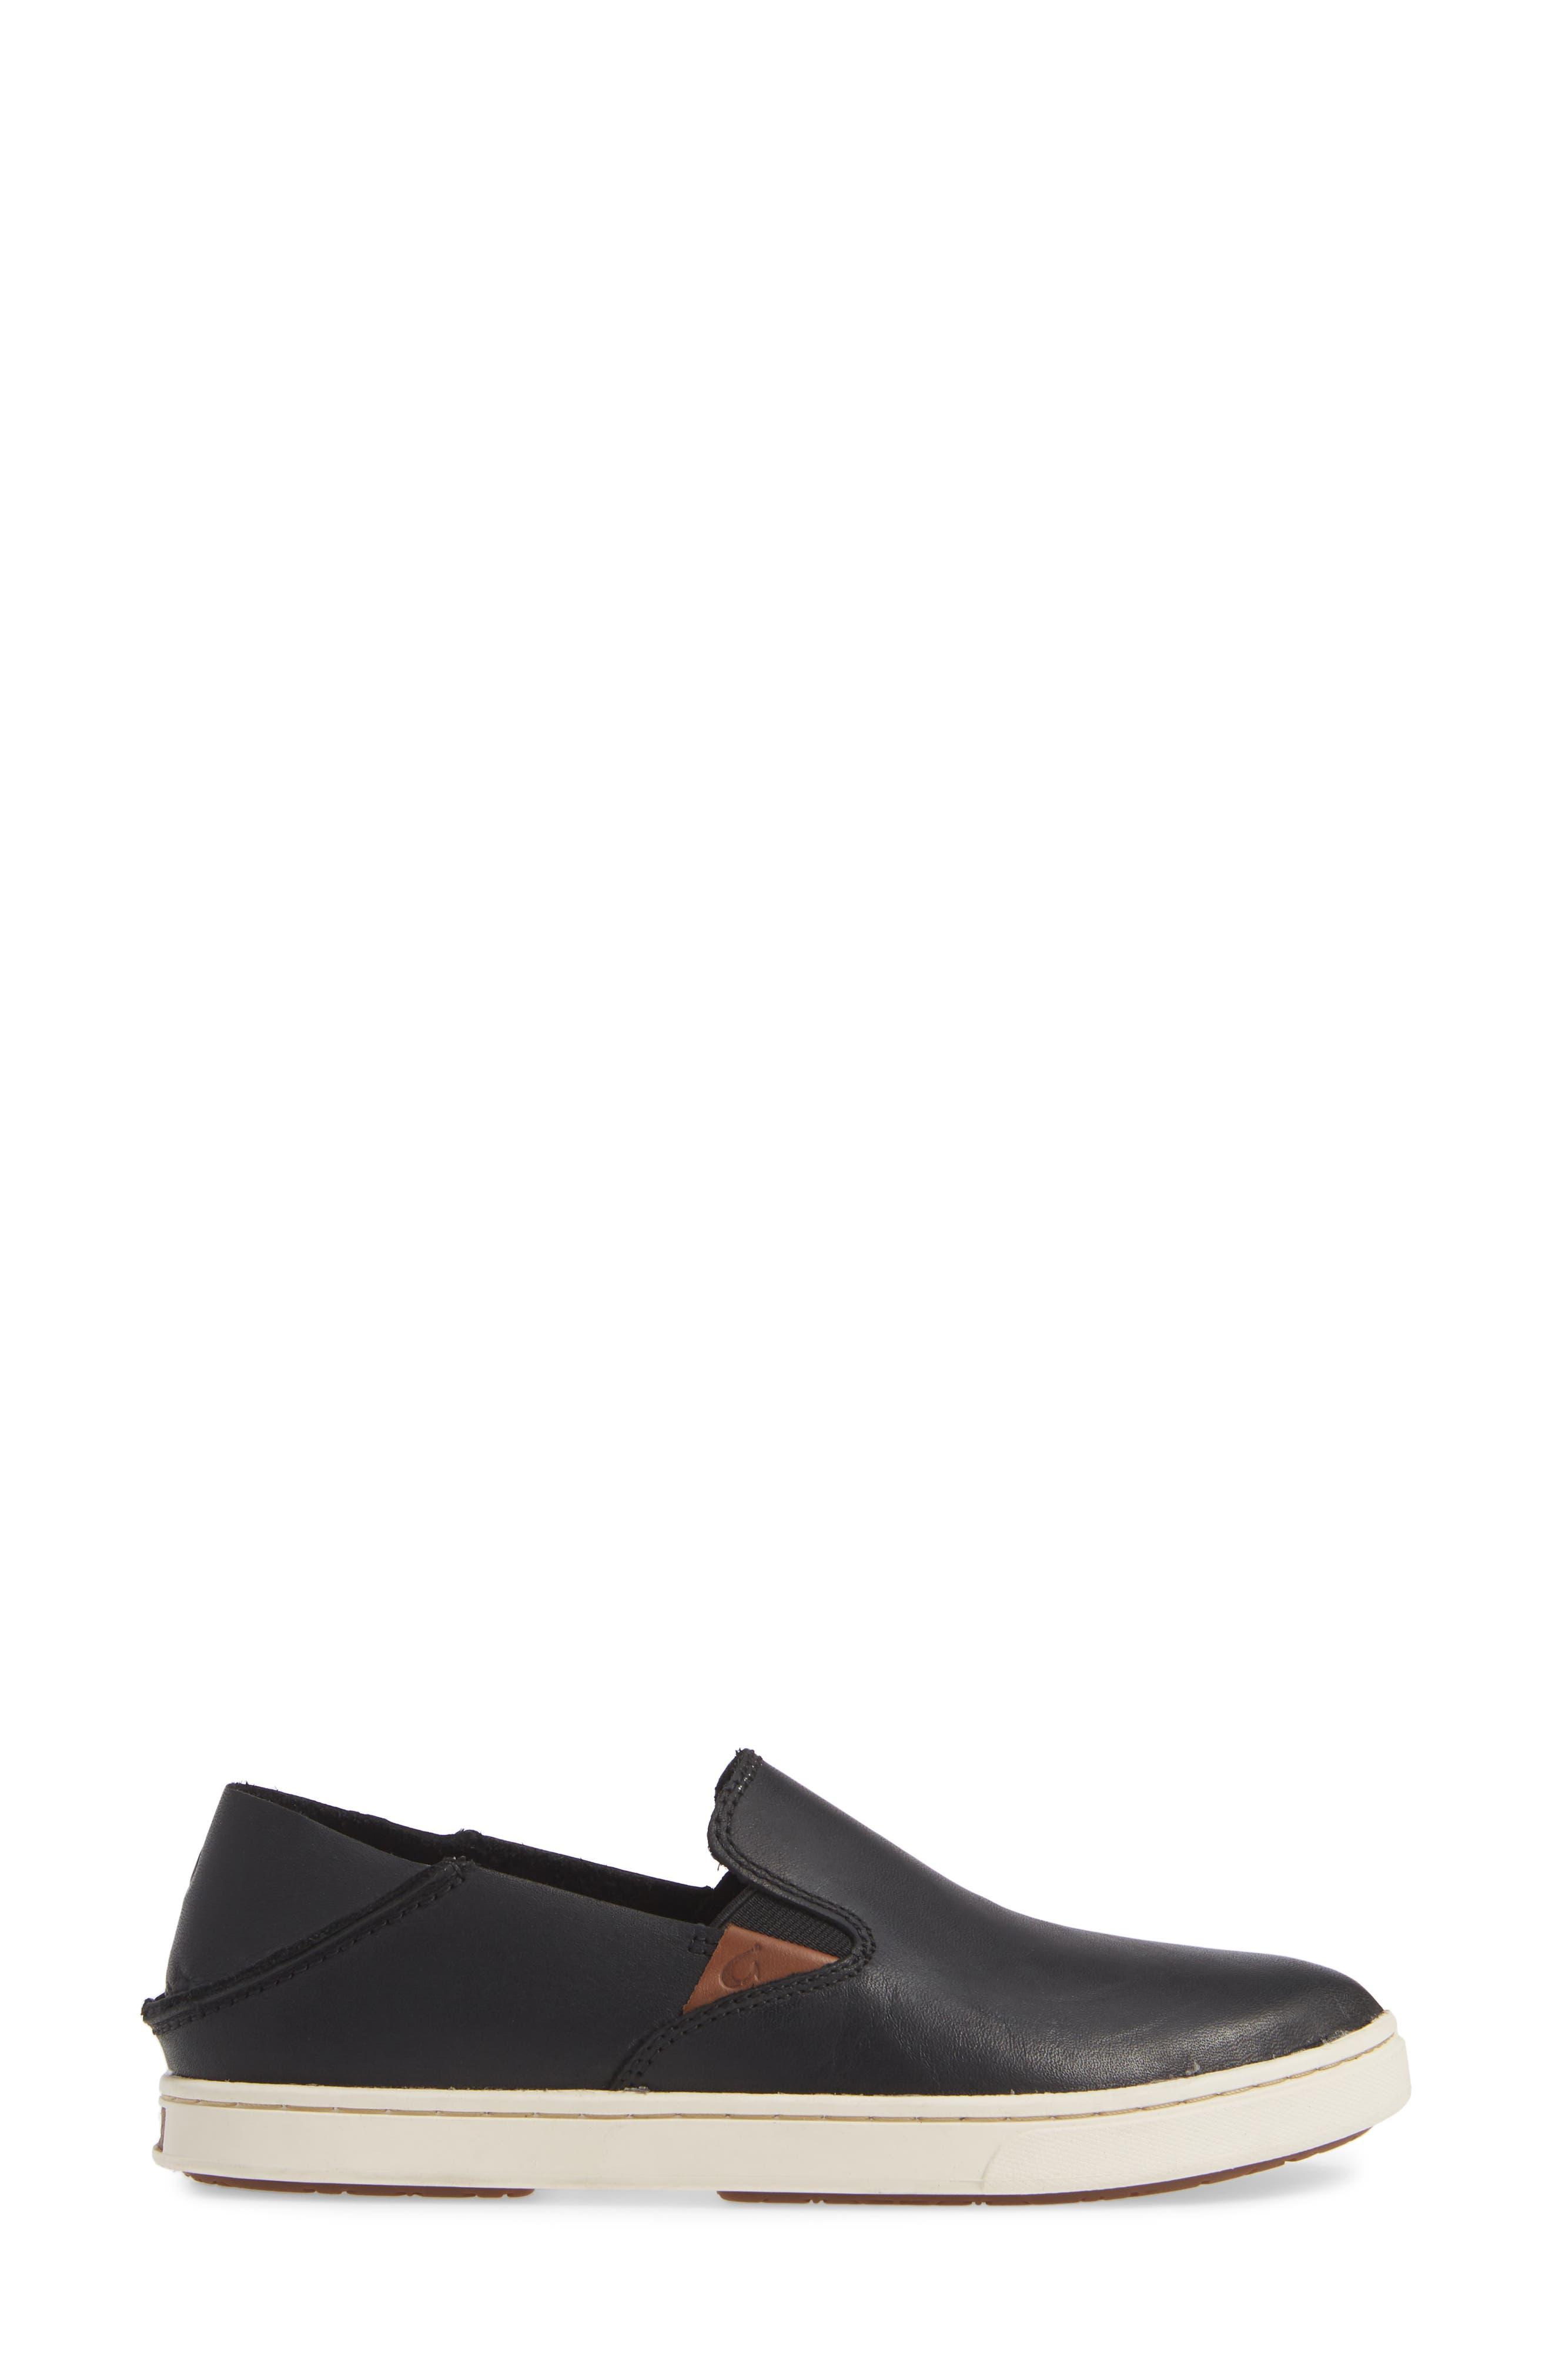 Pehuea Slip-On Sneaker,                             Alternate thumbnail 2, color,                             BLACK/ BLACK LEATHER